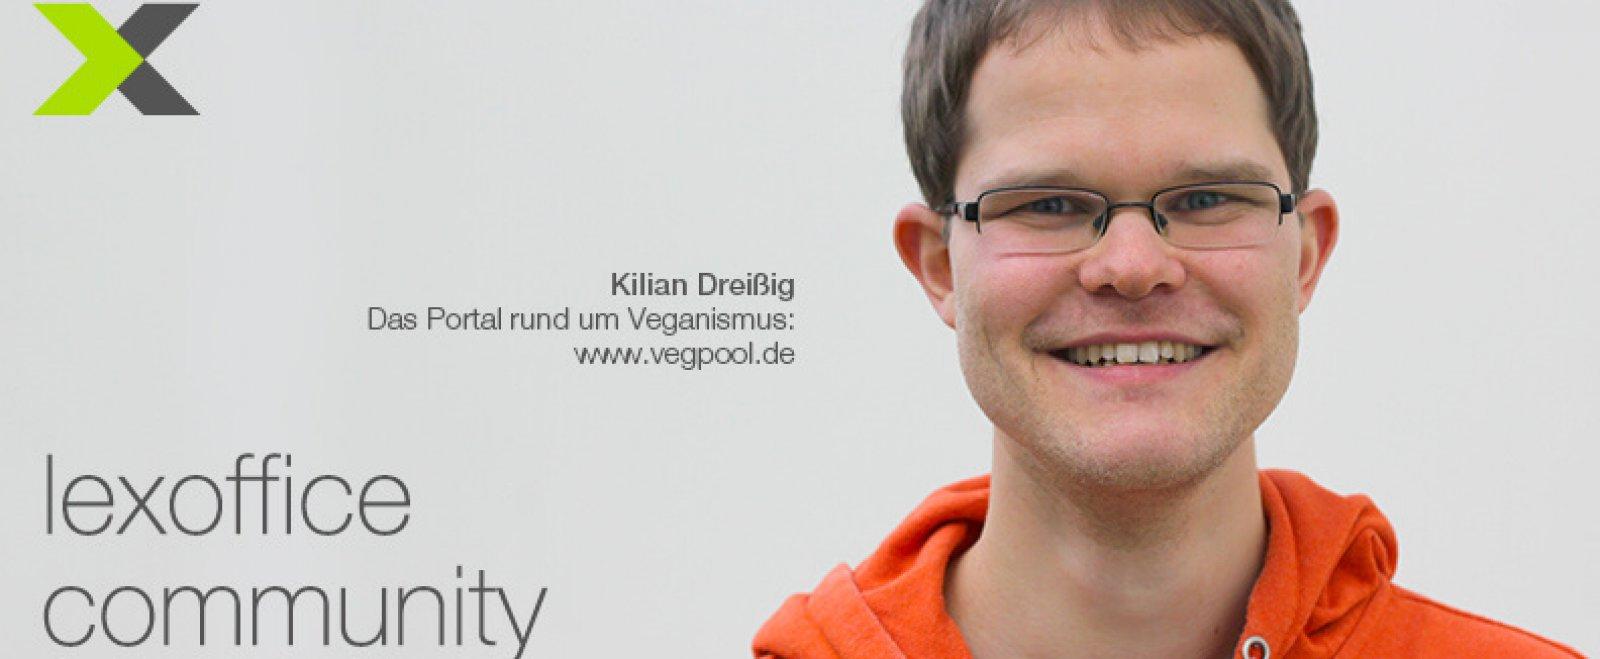 lexoffice Community: User-Interview (22) Kilian Dreißig von vegpool.de